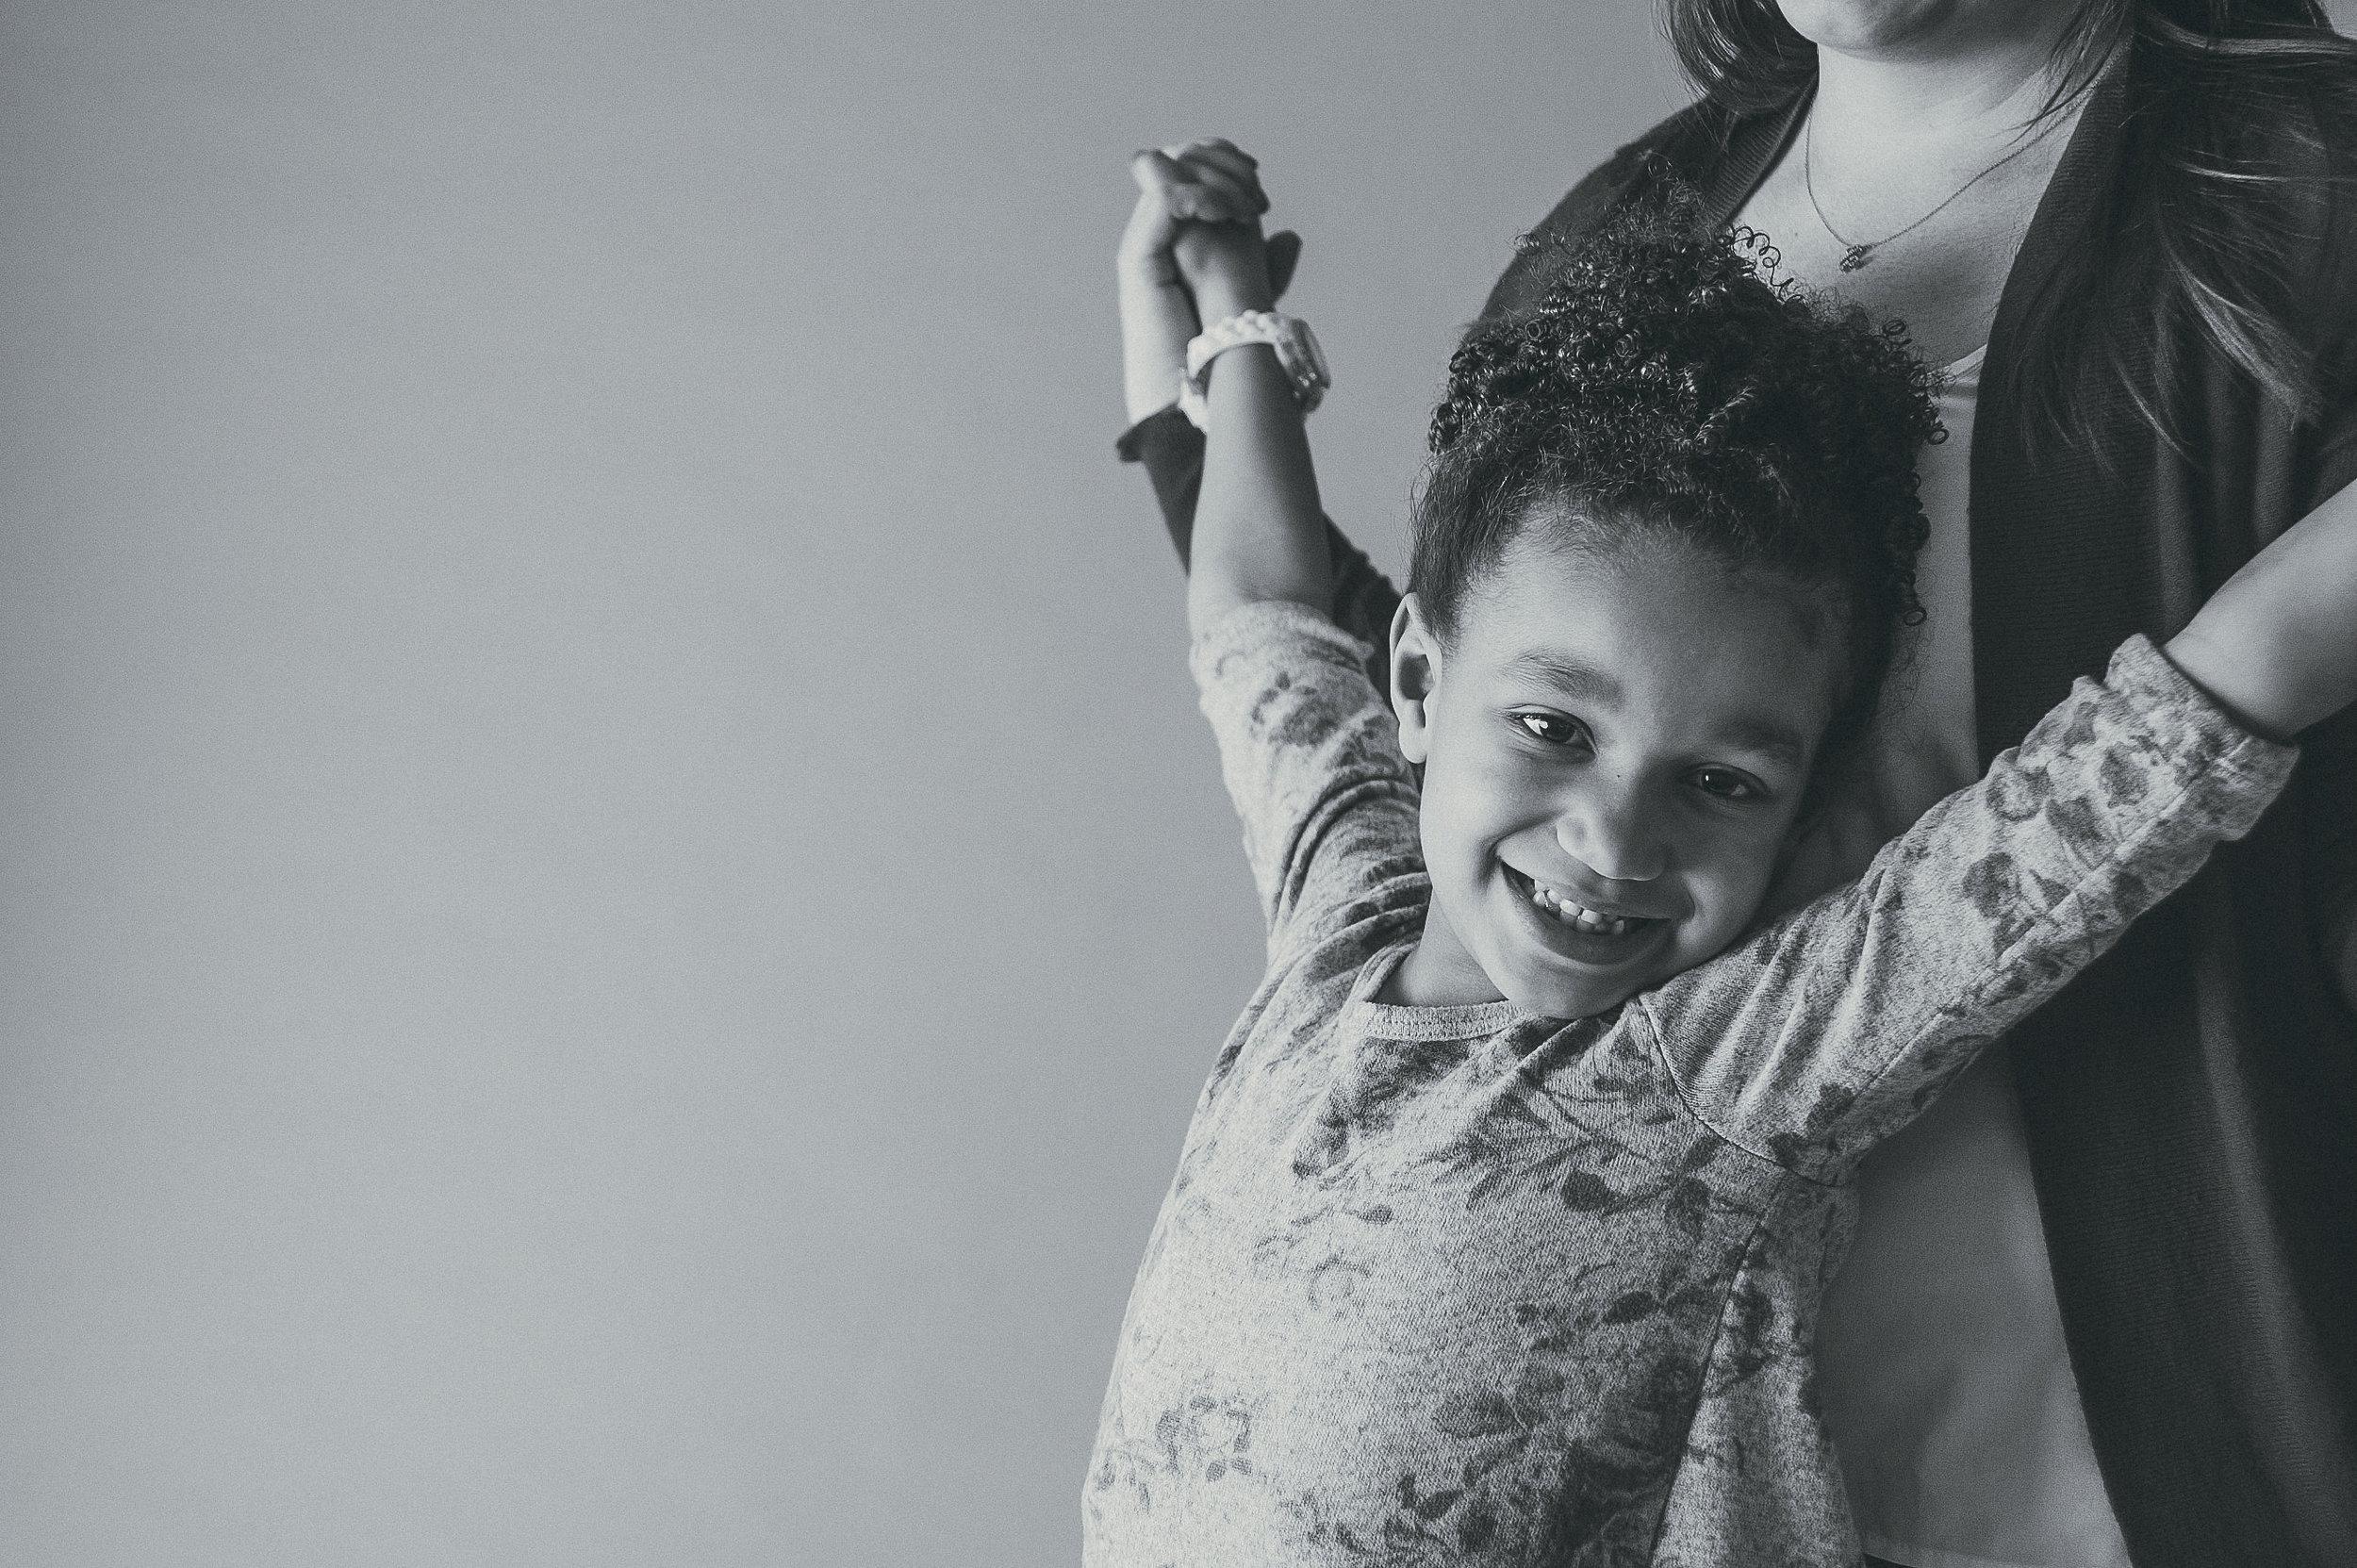 indianapolis child photographer